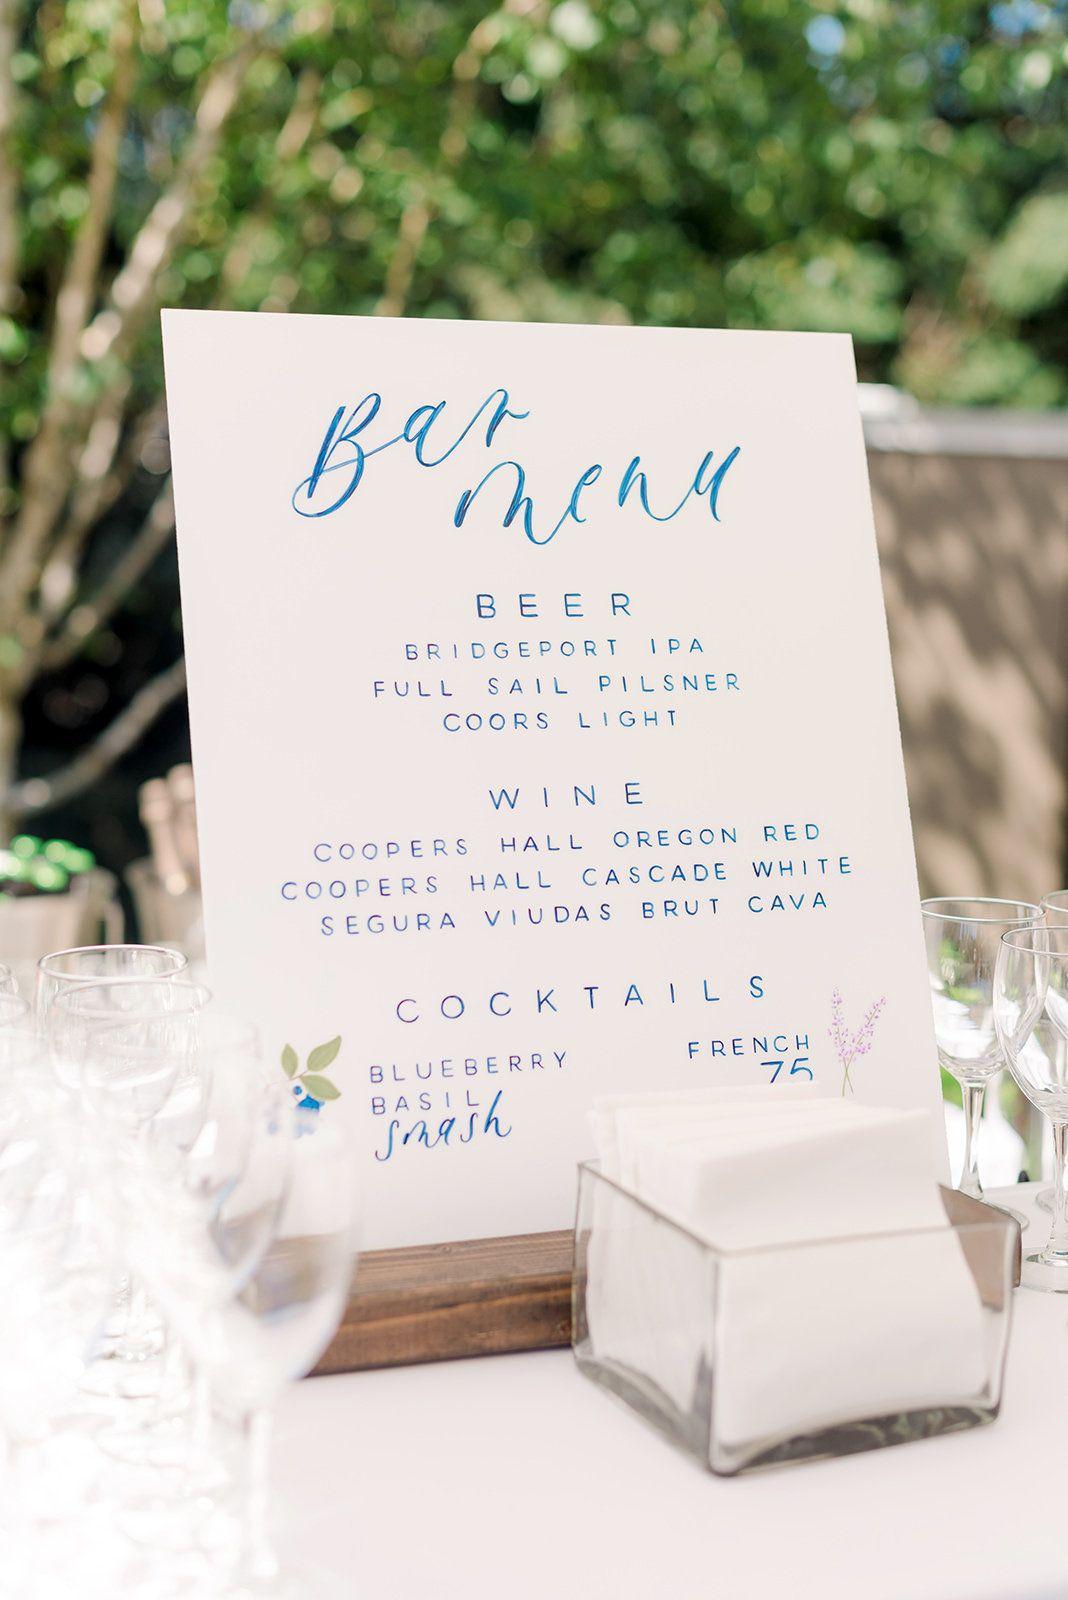 Los Angeles Rams Nfl Player Brandin Cooks Backyard Wedding In Oregon In 2020 Wedding Planning Backyard Wedding Neon Wedding